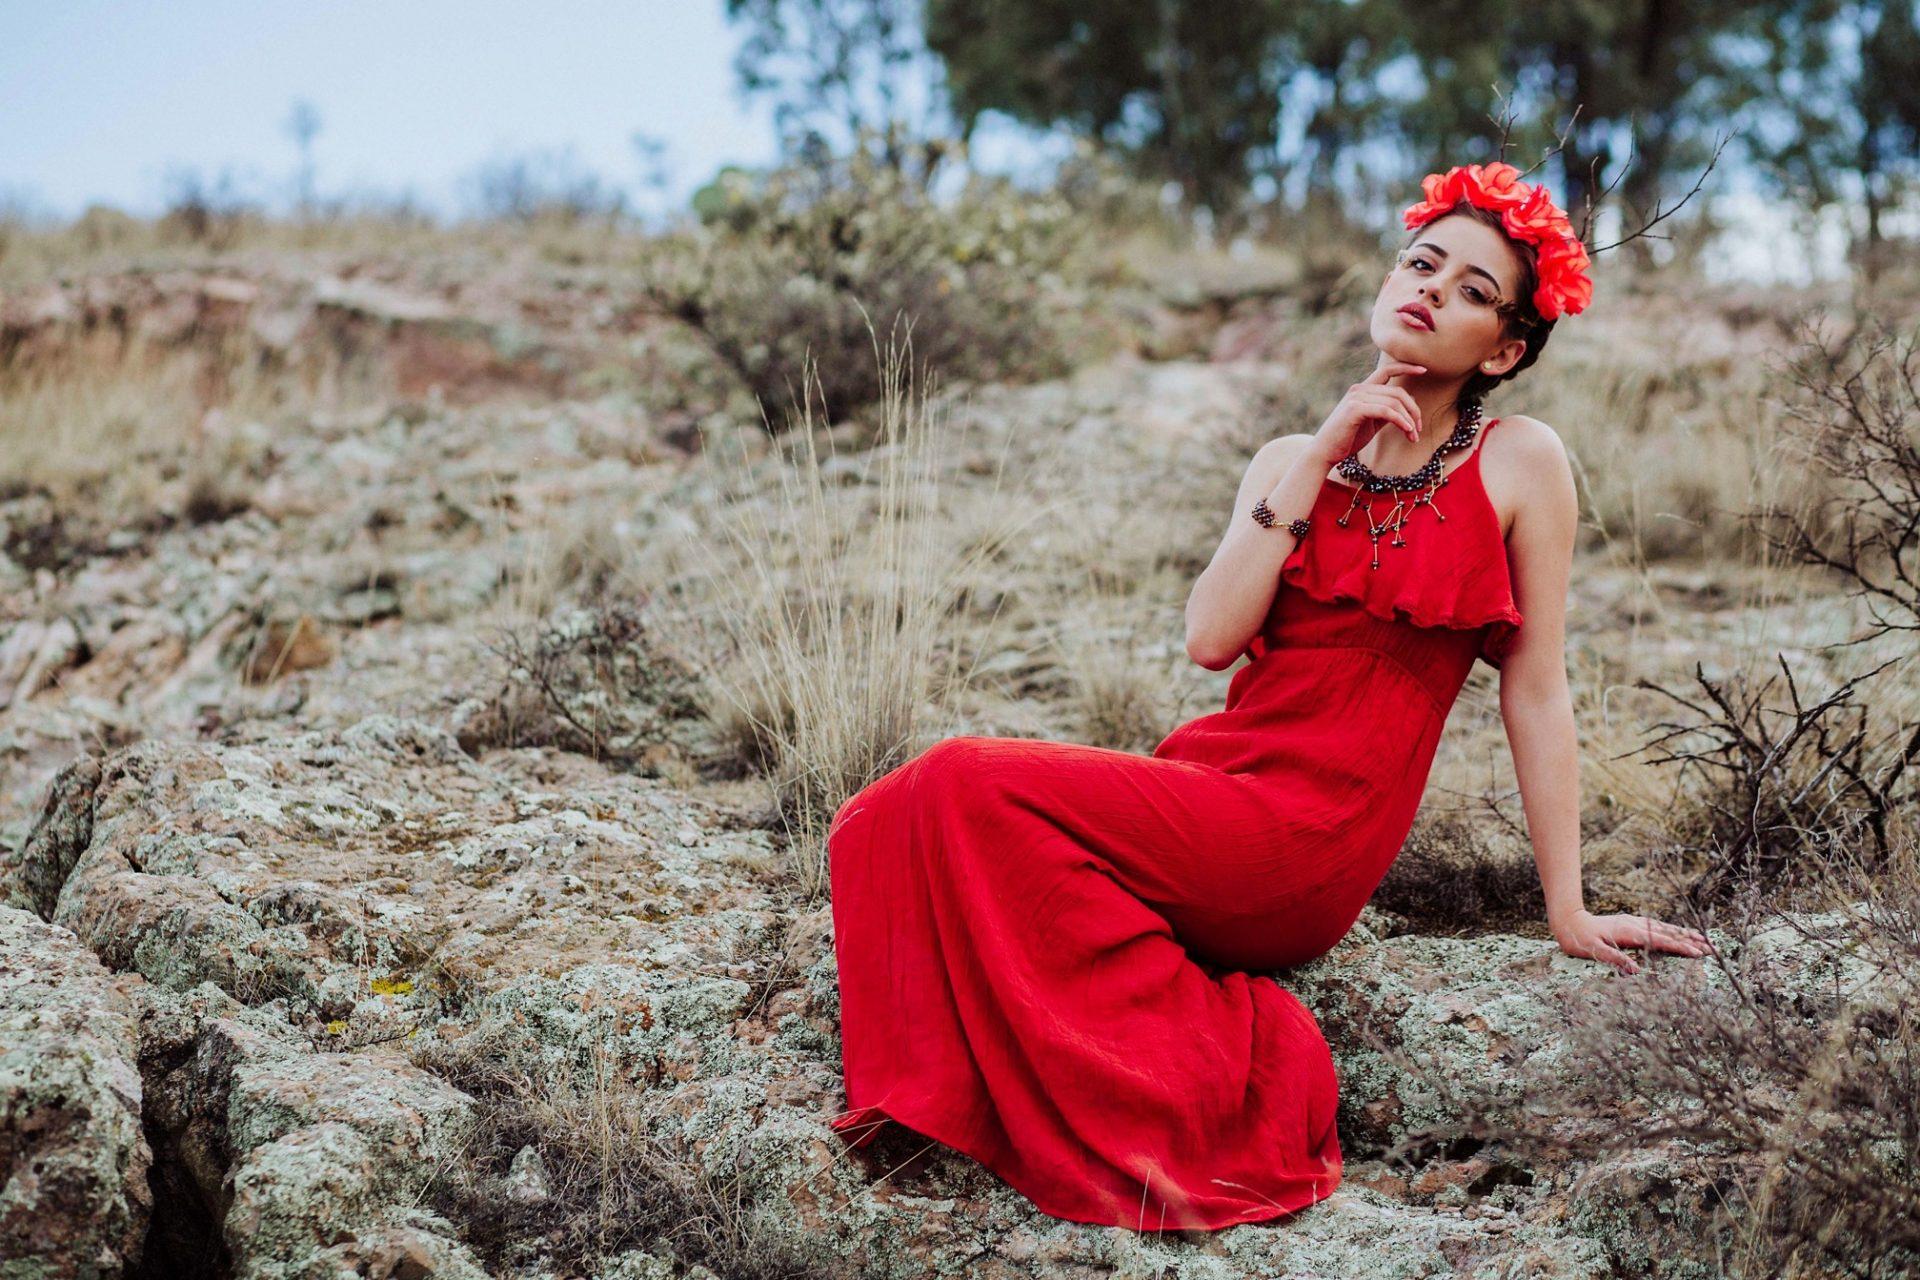 fotografo_profesional_zacatecas_sesion_casual_fashion-21